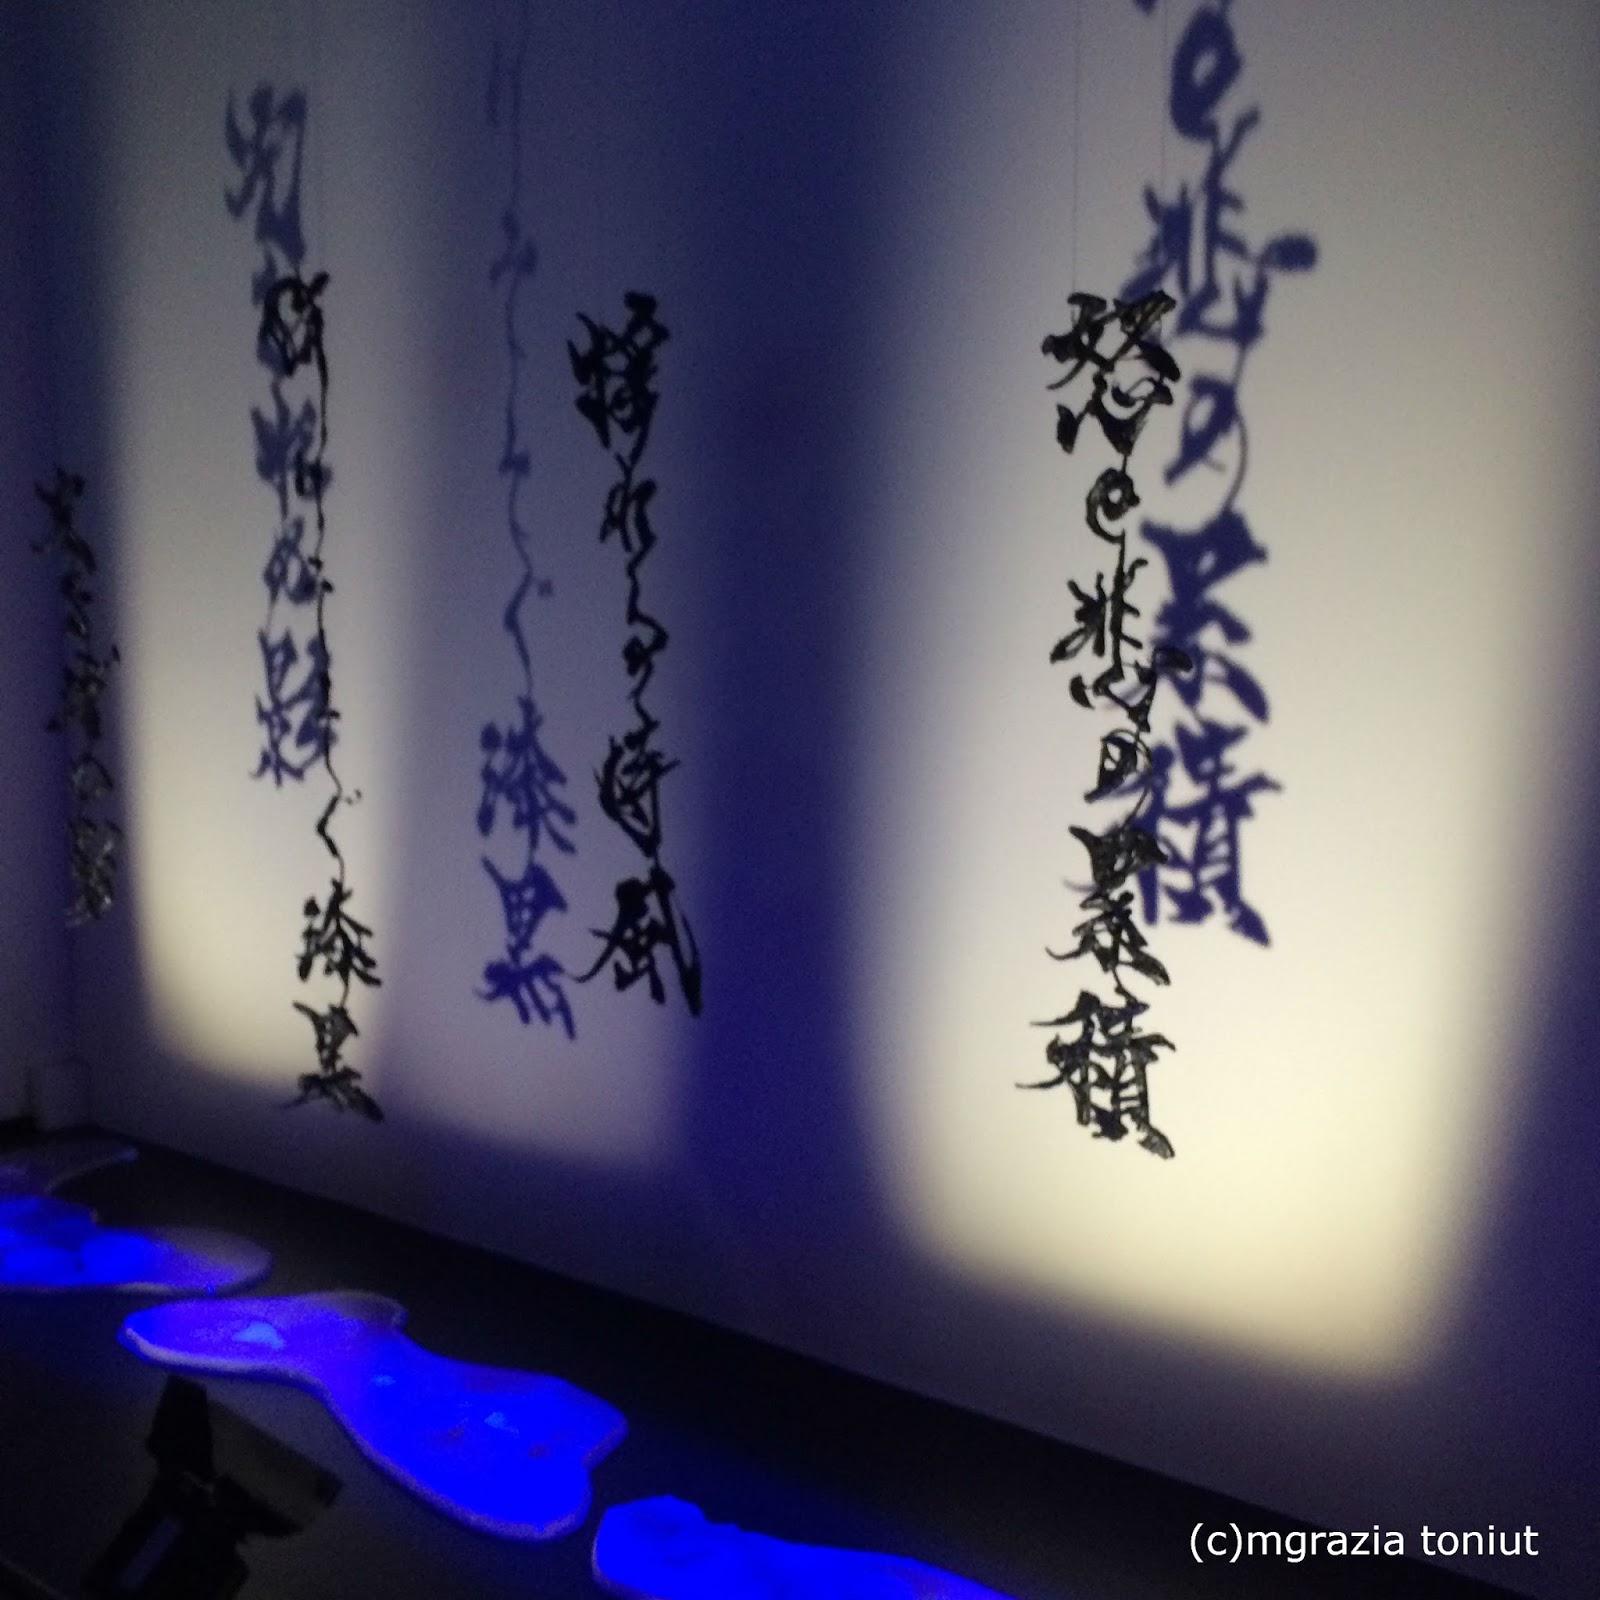 Lampade Giapponesi Milano: Articoli japanblues. Lampade vintage ...